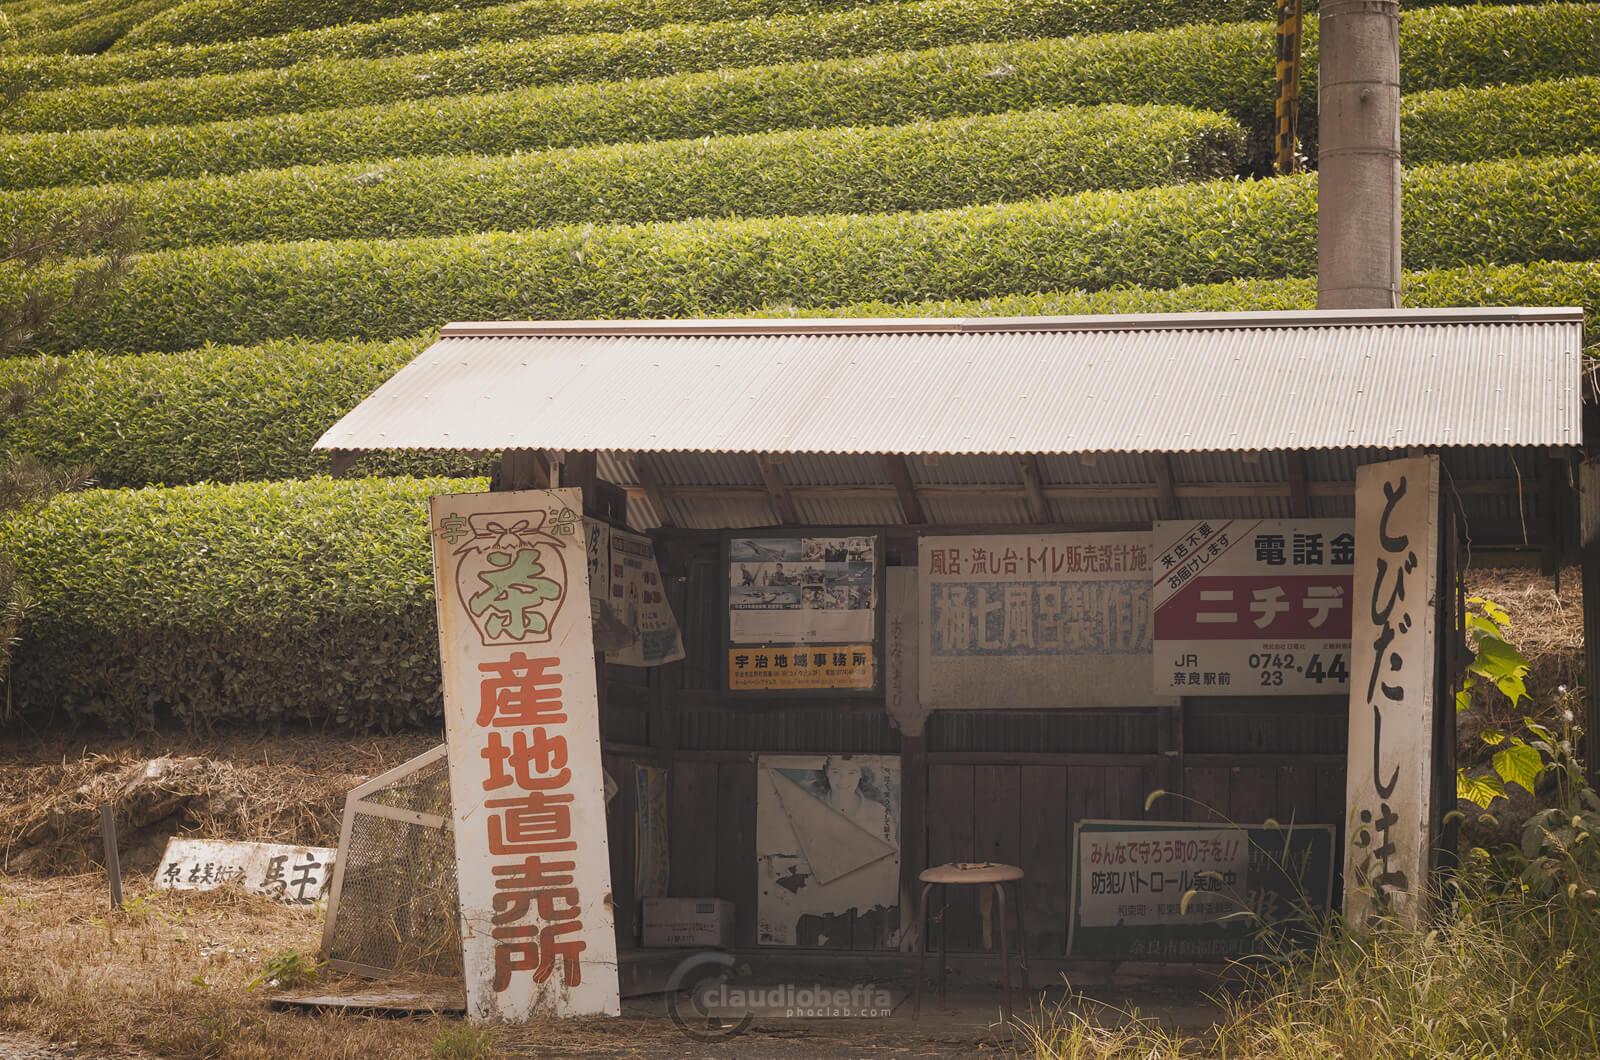 Bus stop at the tea field, Wazuka, Japan, Tradition, Travel.